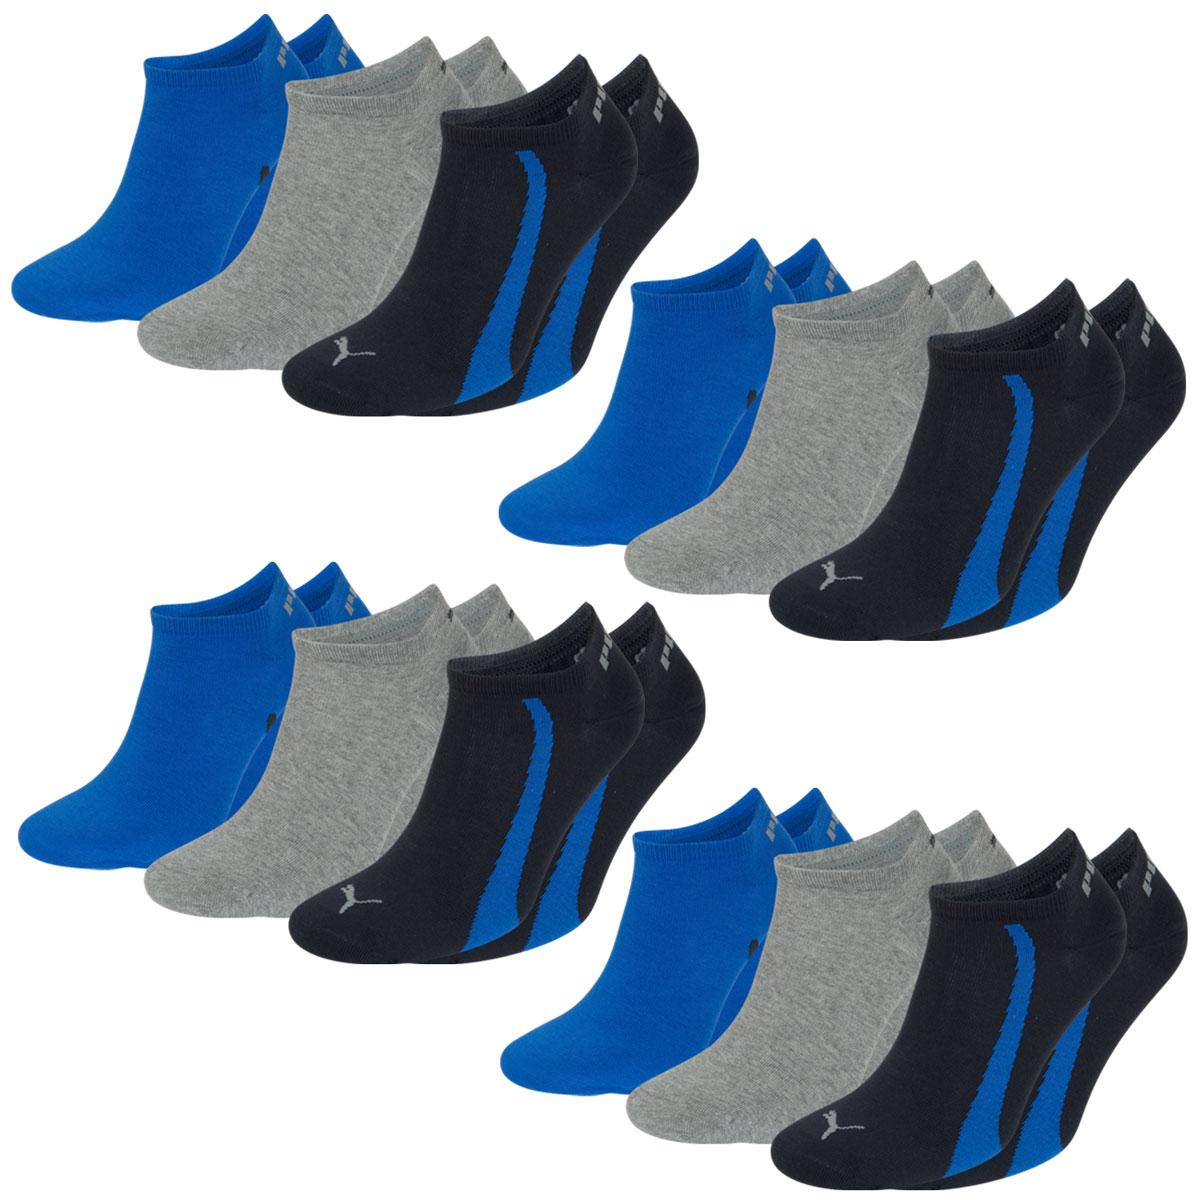 12 Paar Puma Füsslinge, navy / grey / strong blue, Farbe 6